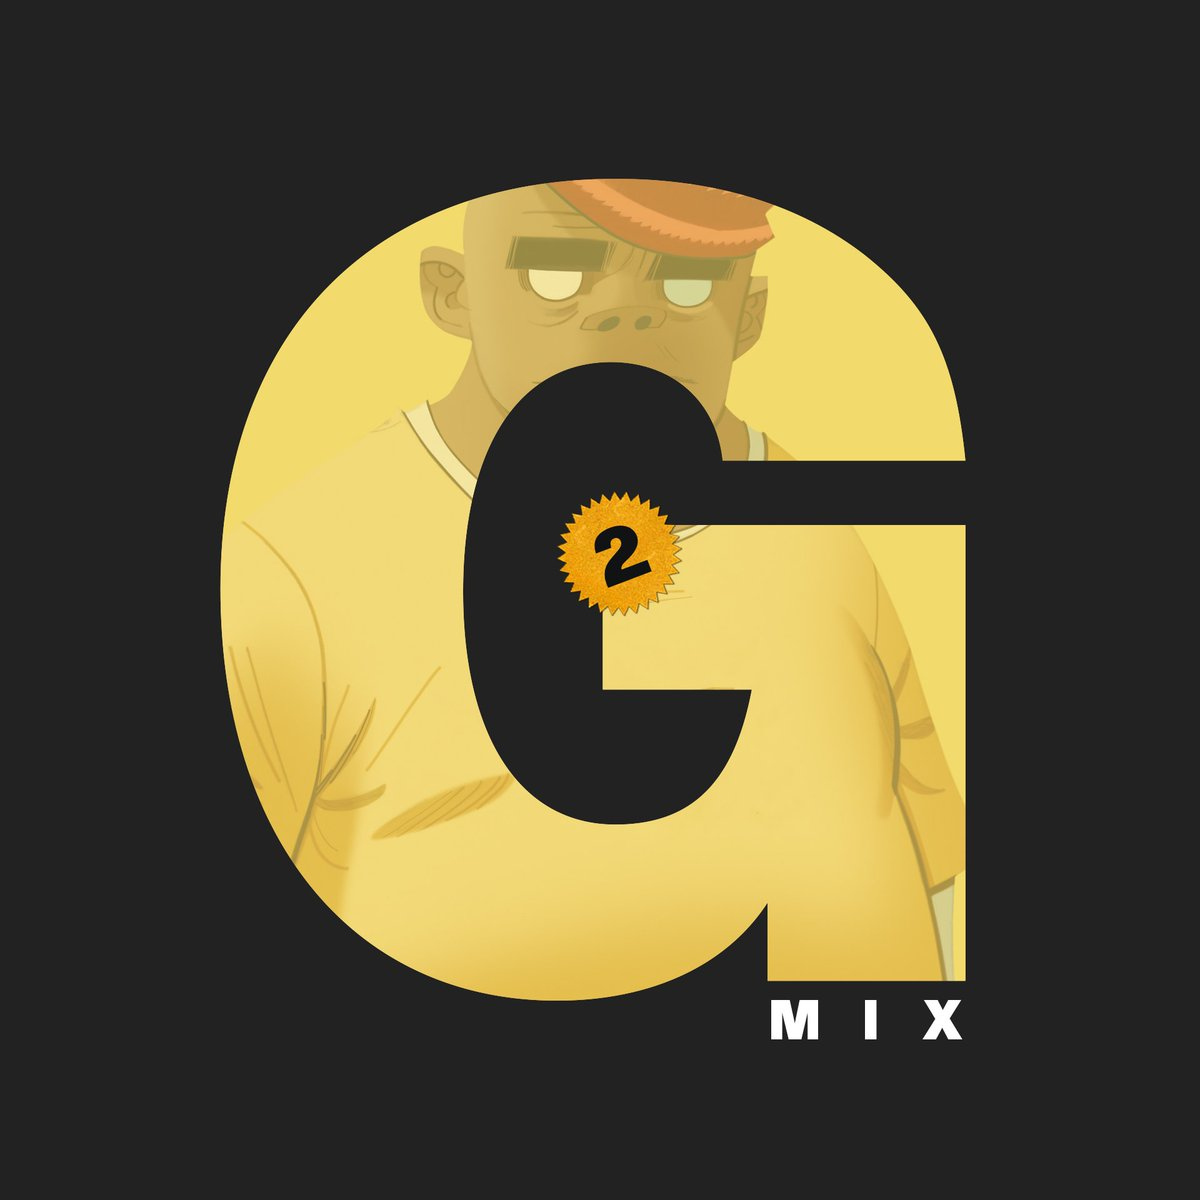 G-Mix: Russel 2